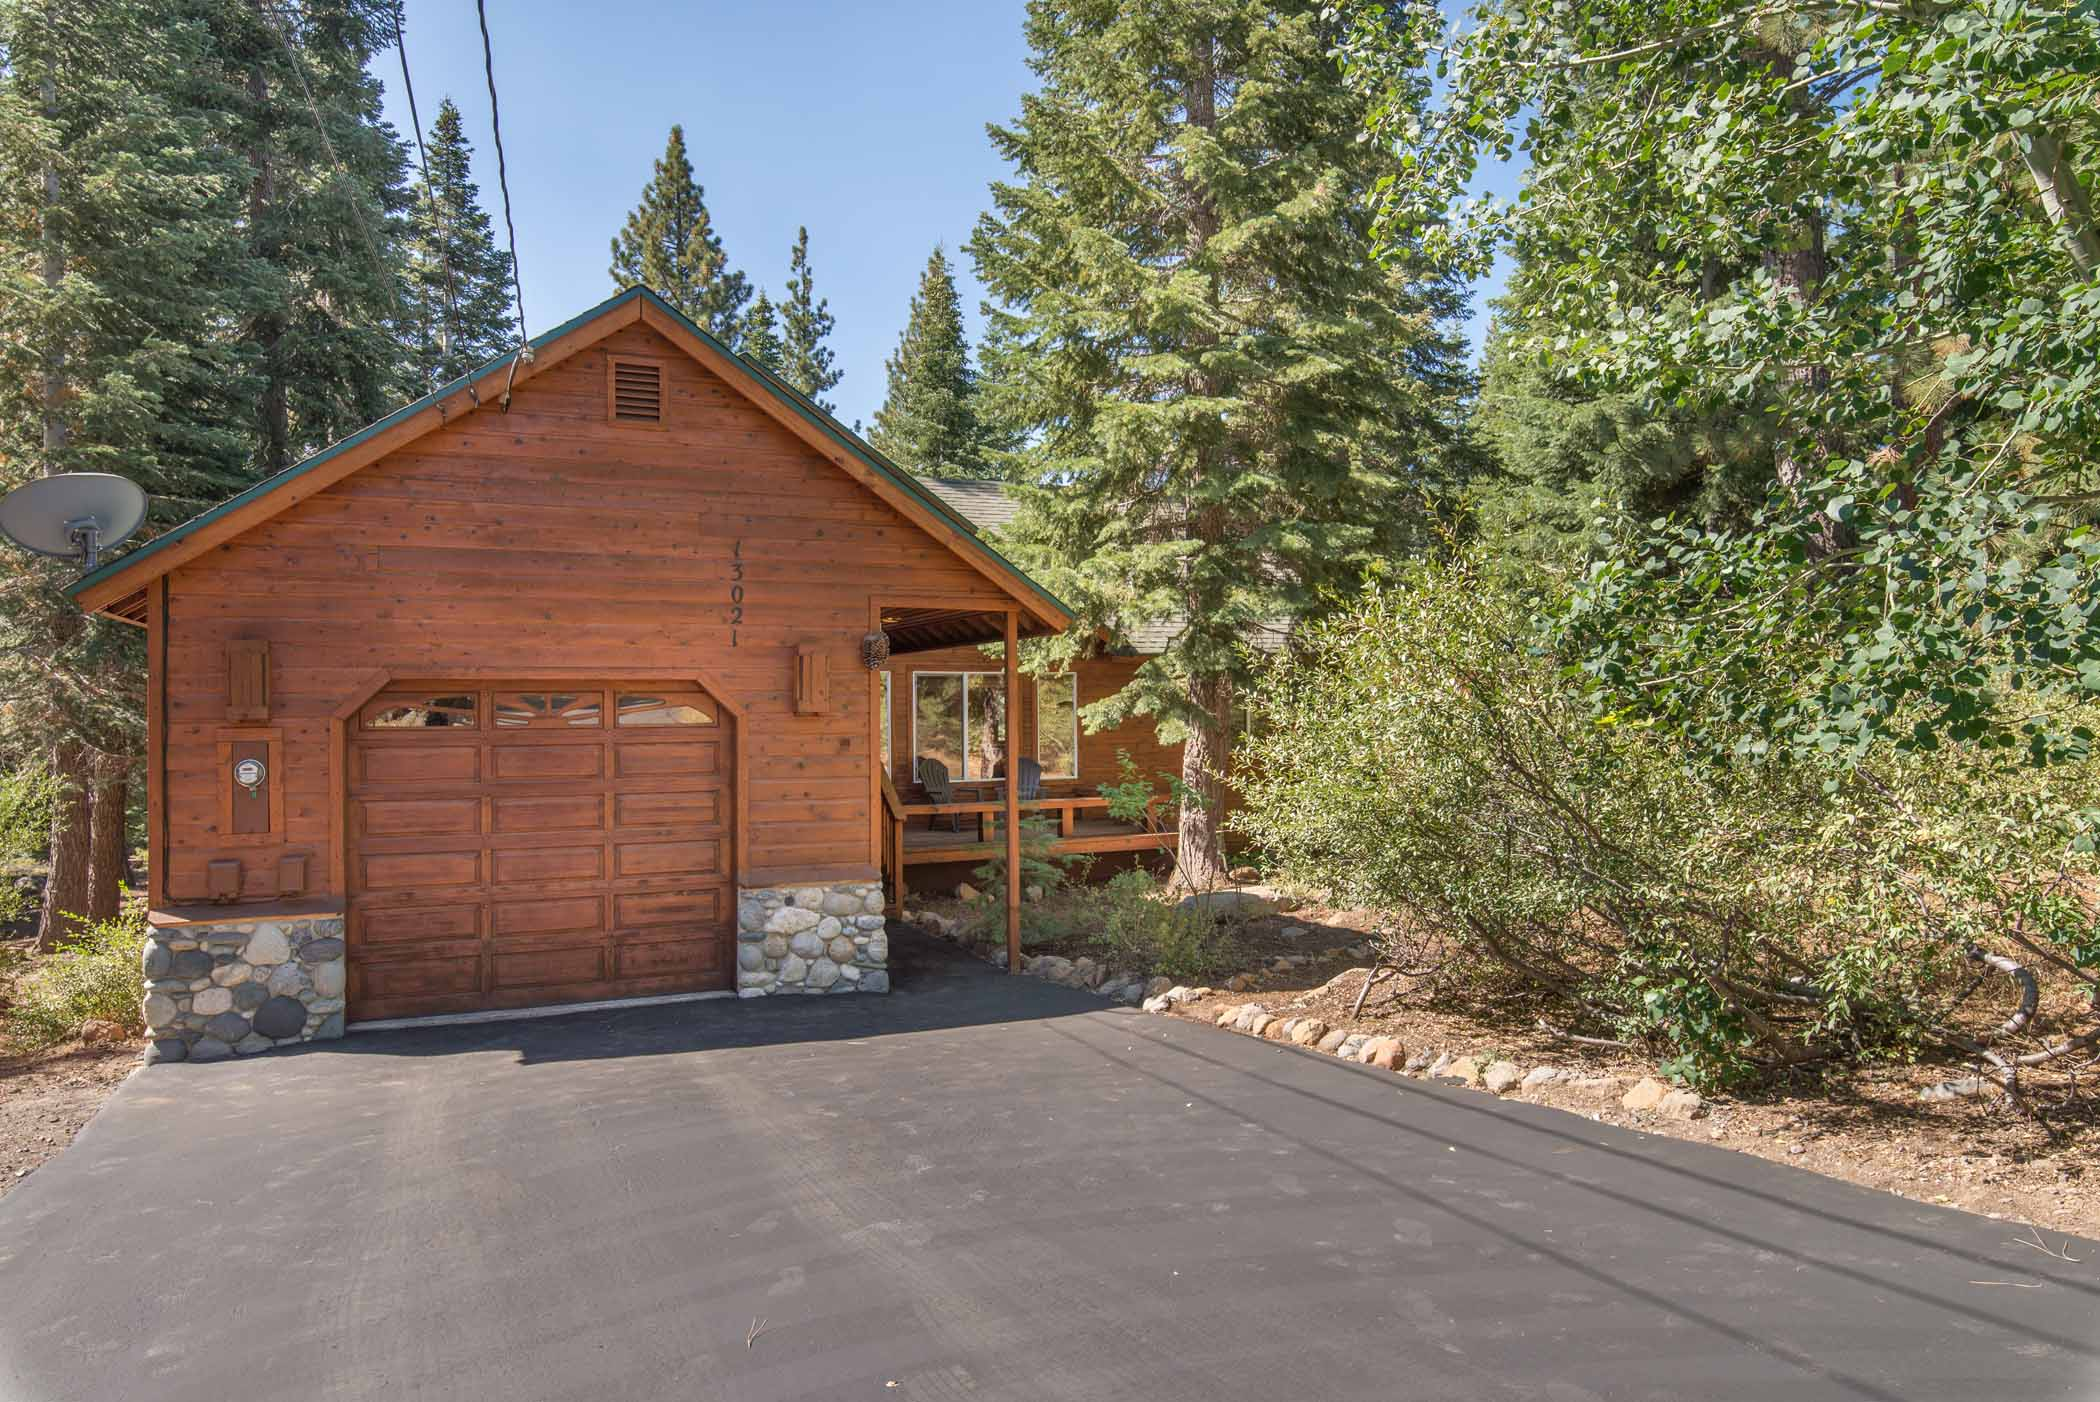 SOLD! Under $600,000 in Tahoe Donner